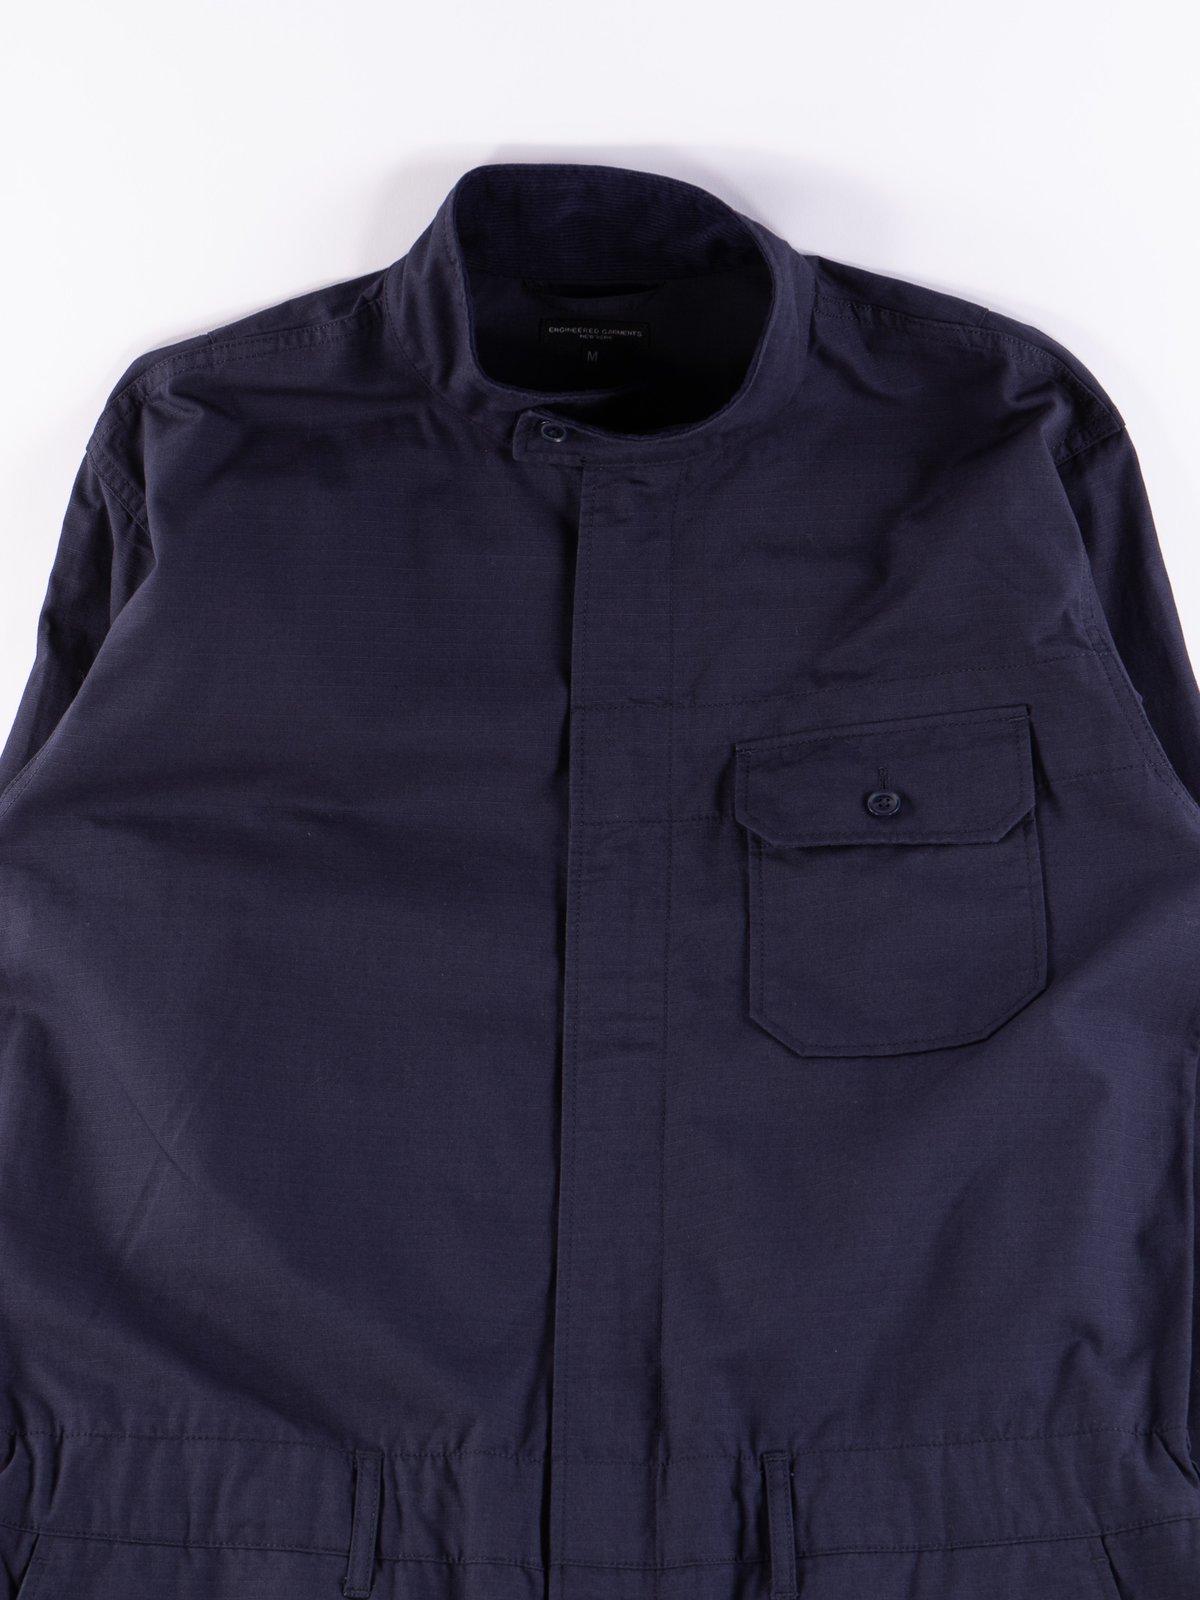 Dark Navy Cotton Ripstop Boiler Suit - Image 4